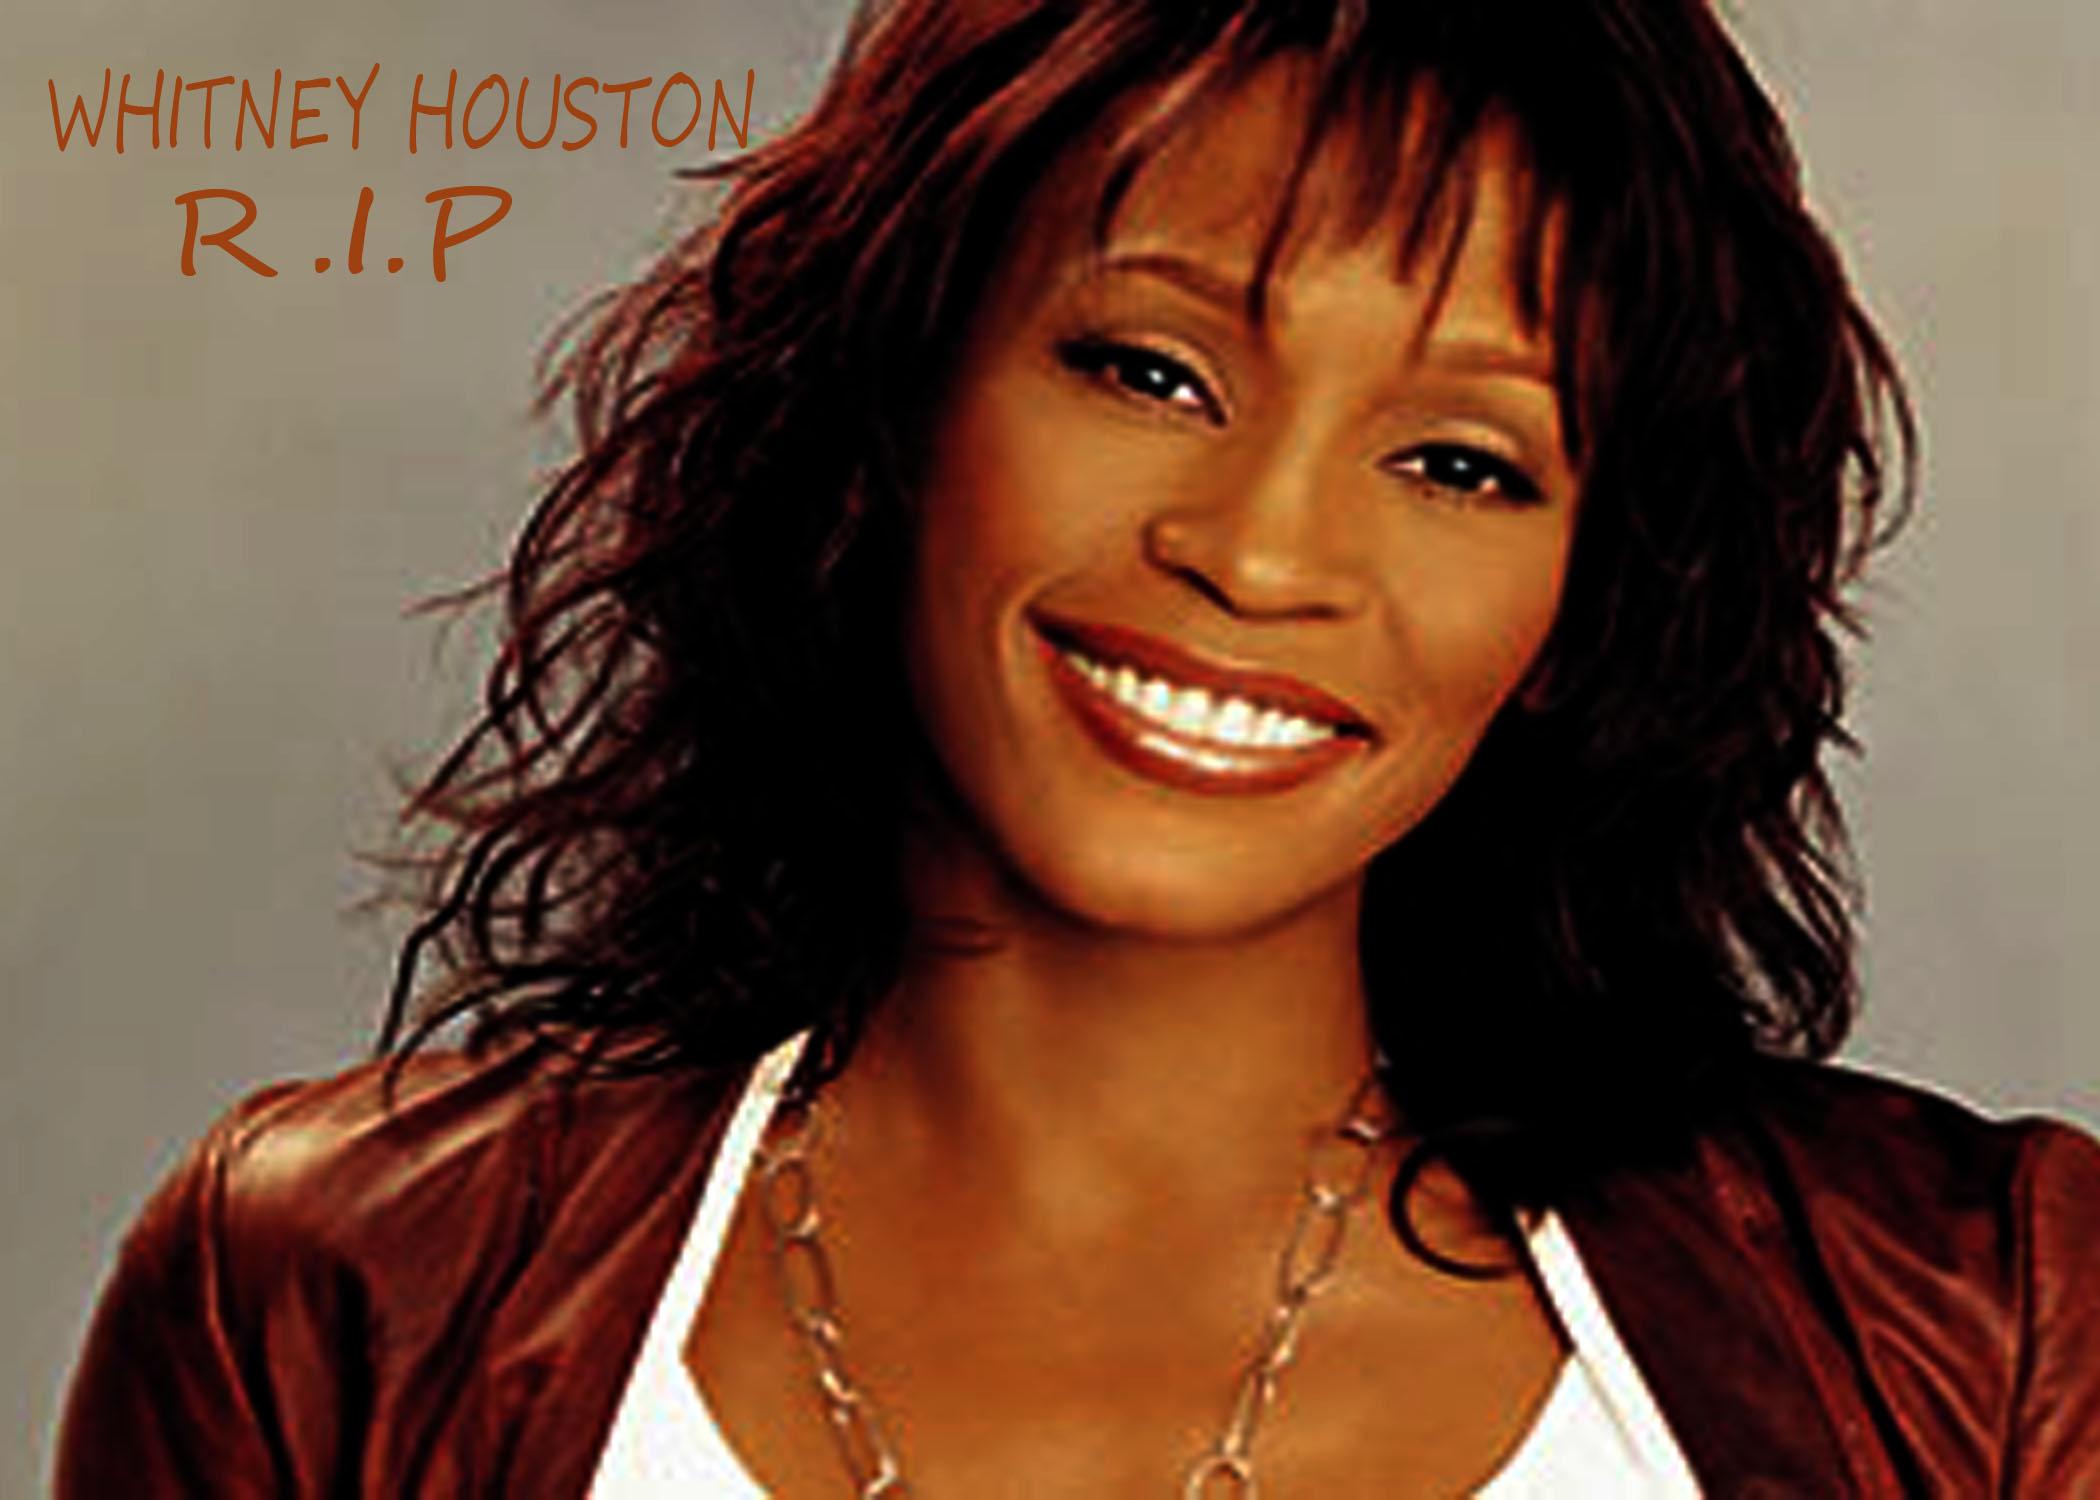 Whitney Houston Hairstyles Rip Whitney Houston By Rwhitney75 On Deviantart